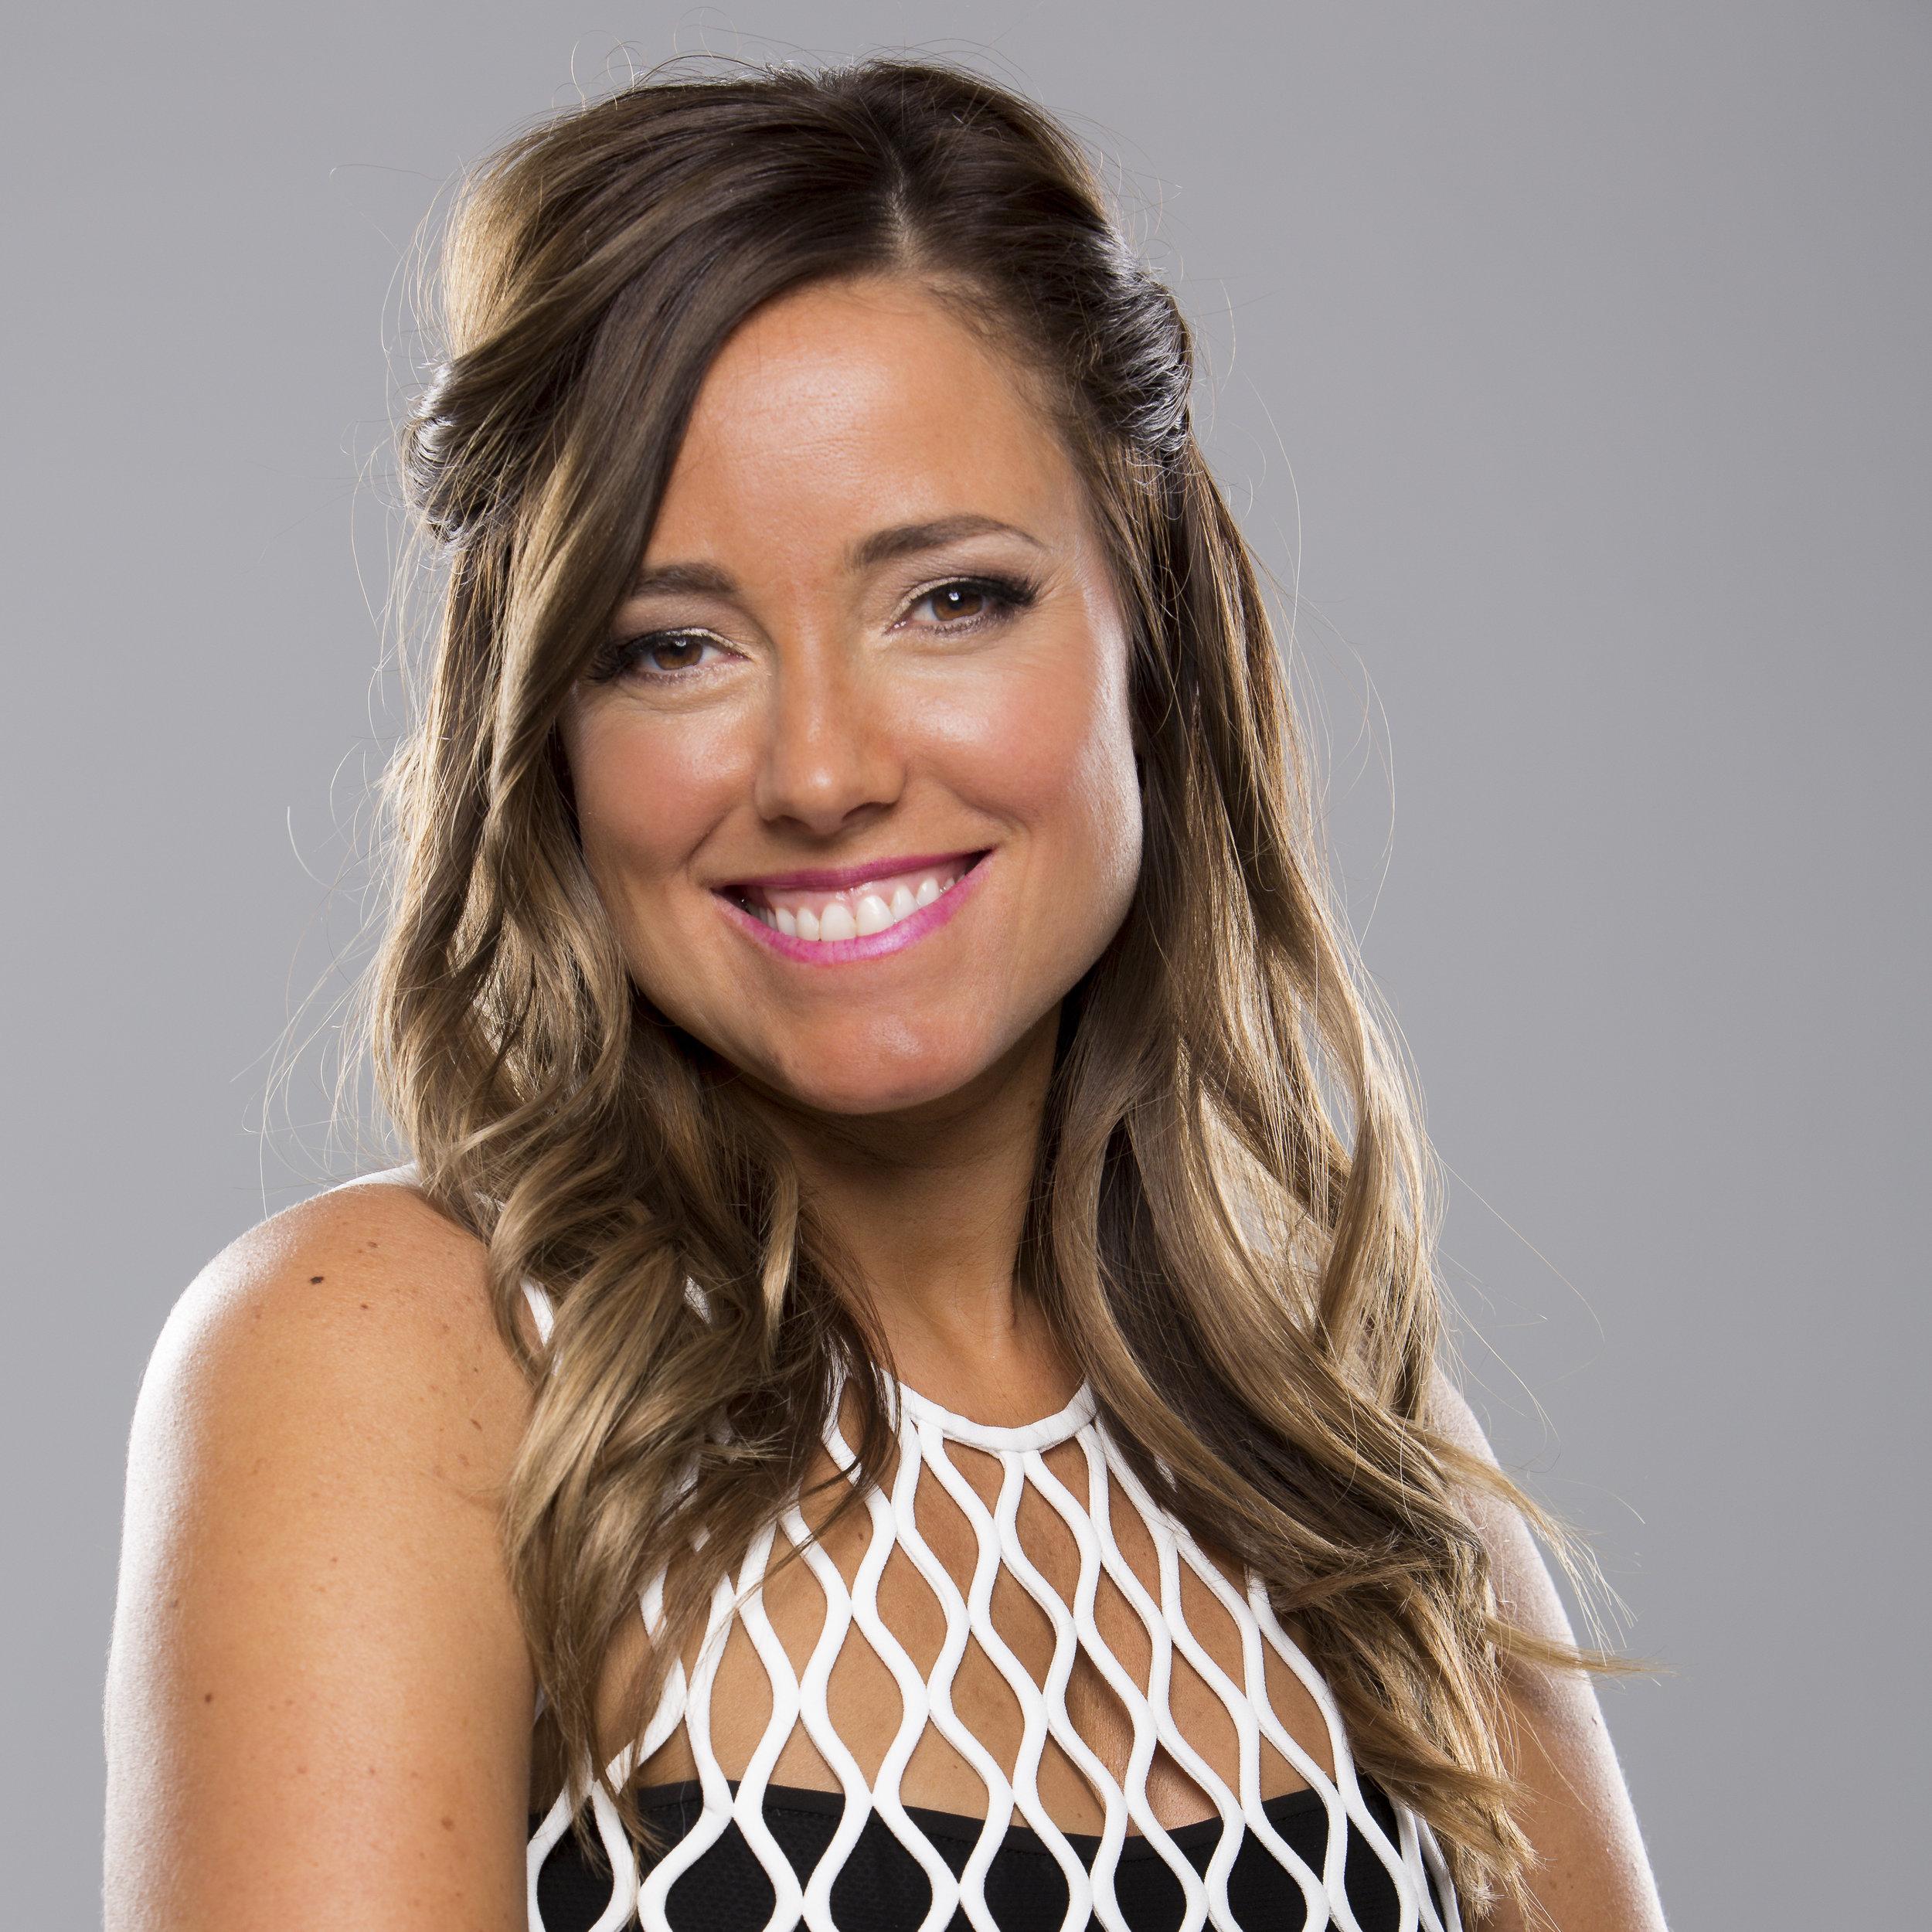 Amber Mac - Entrepreneur, Author, Speaker, & Media Personality